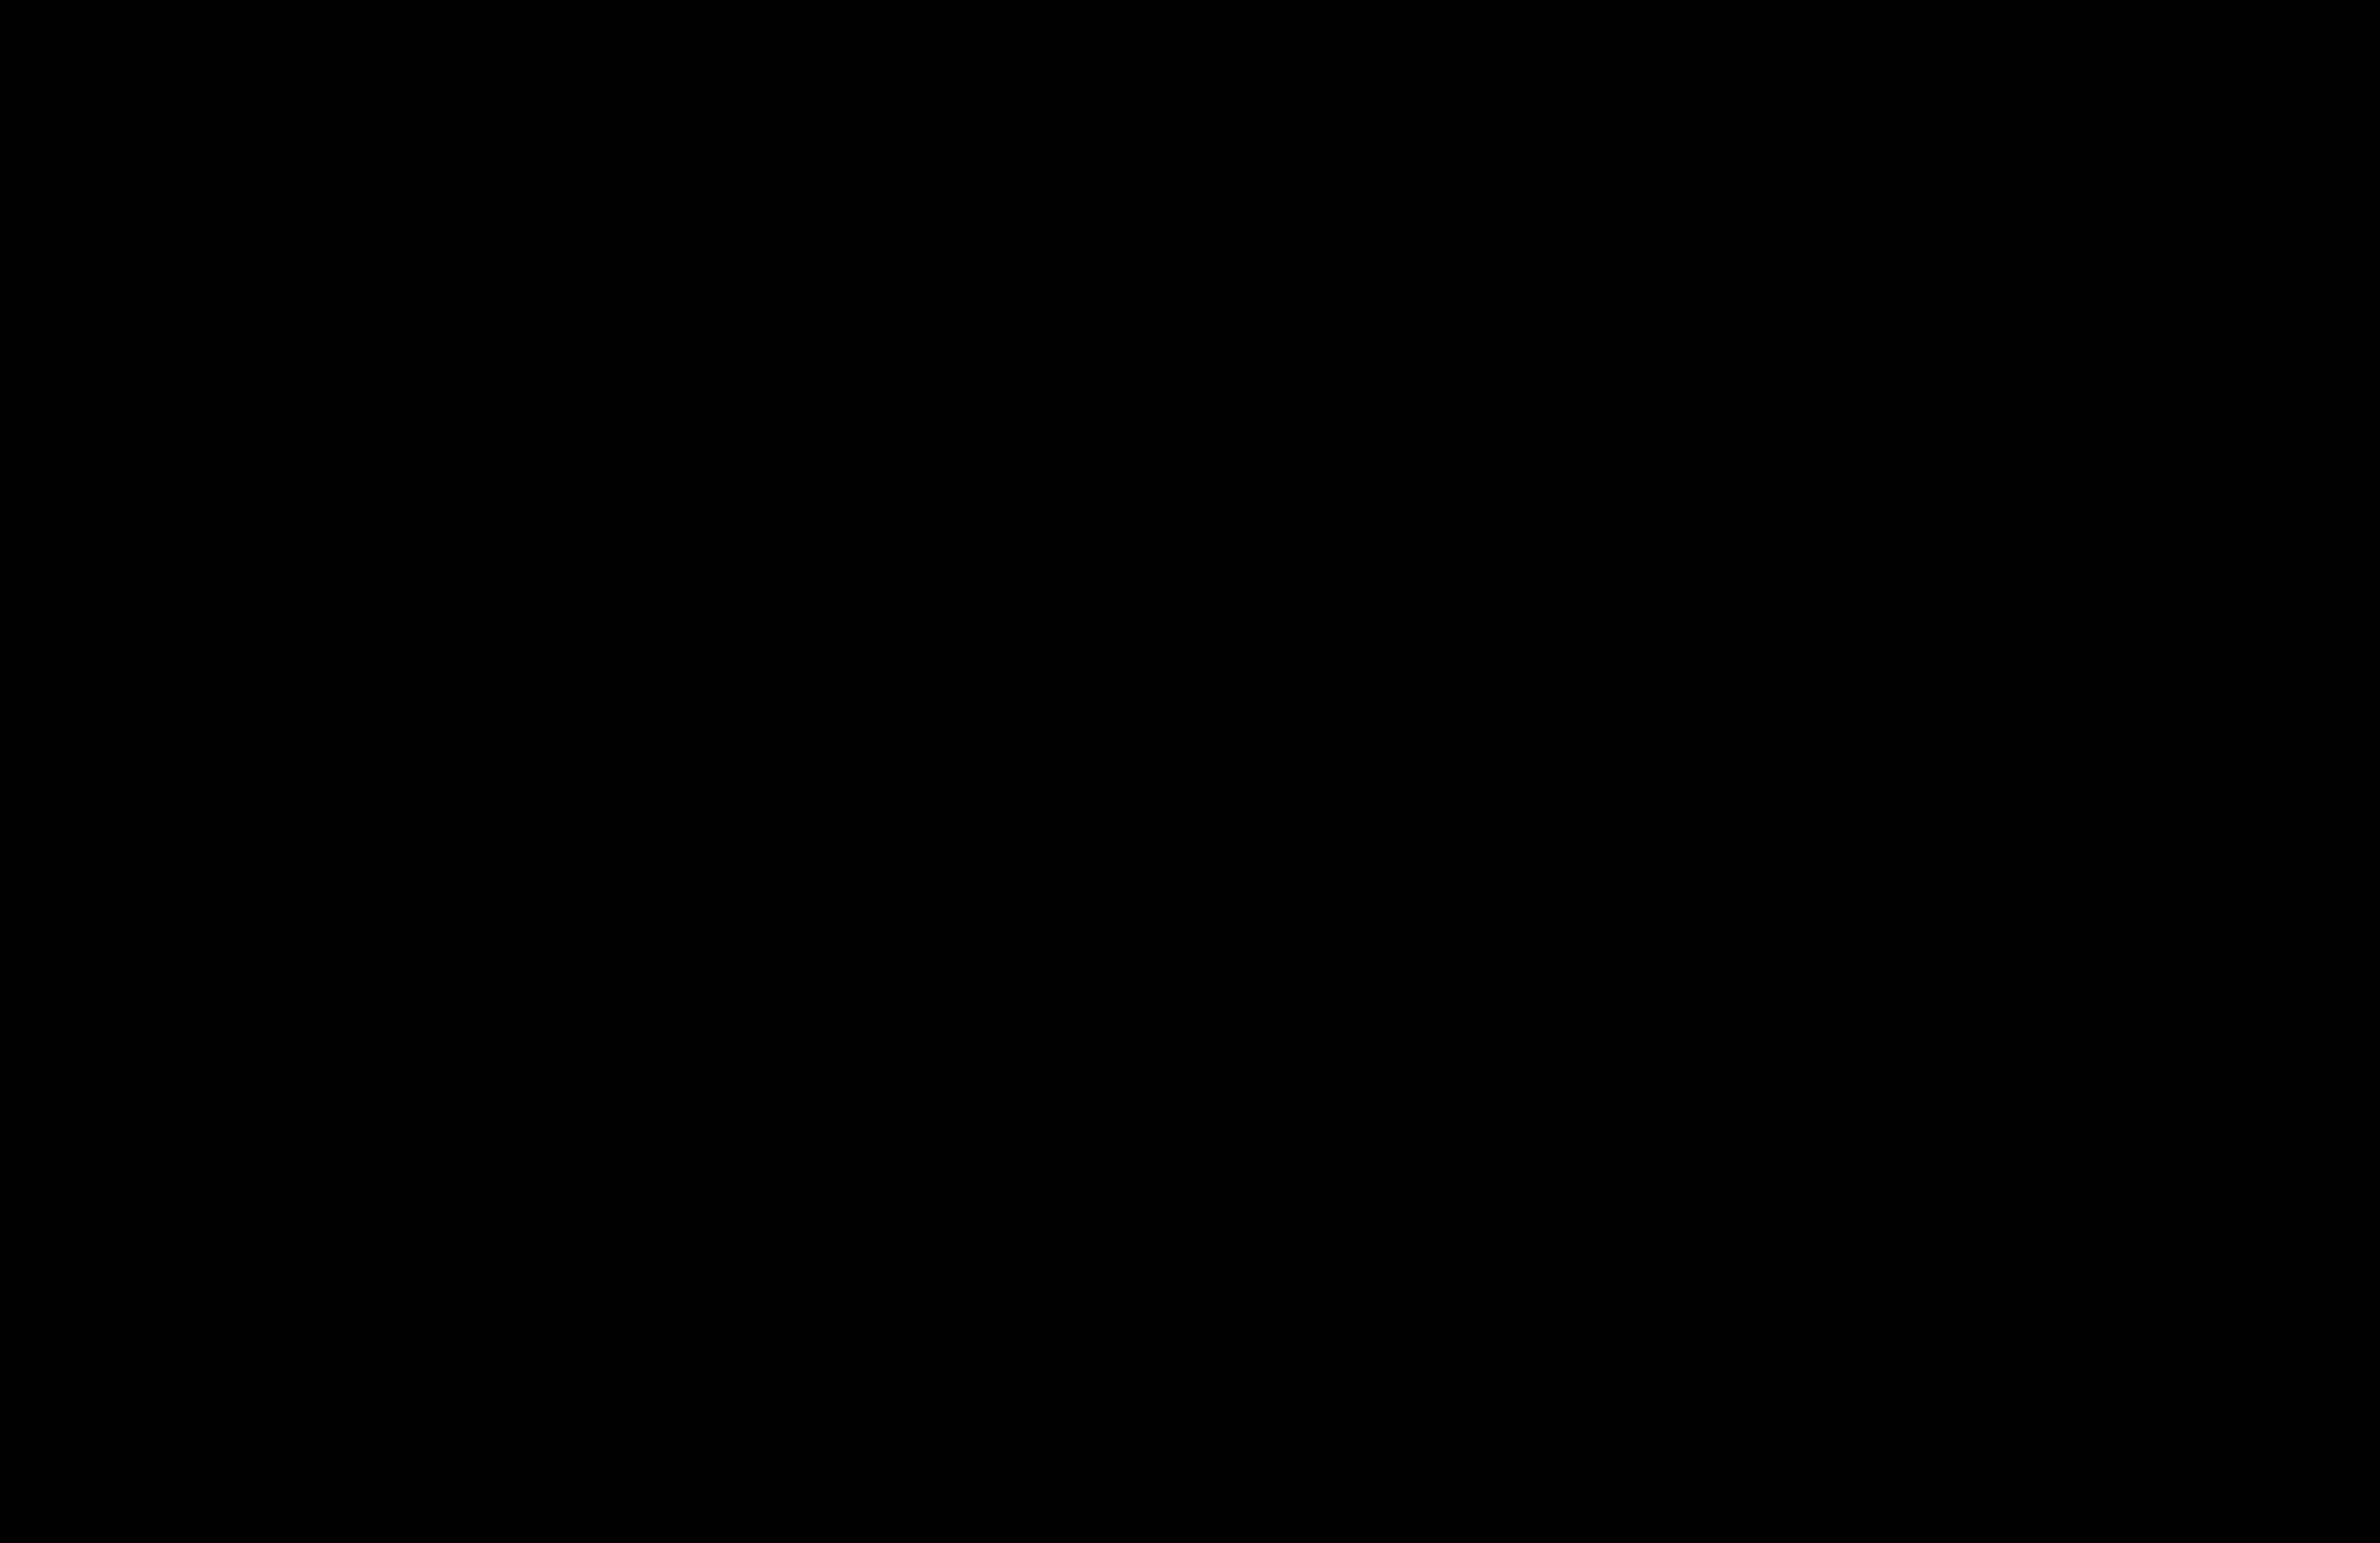 umbro logo 1 - Umbro Logo